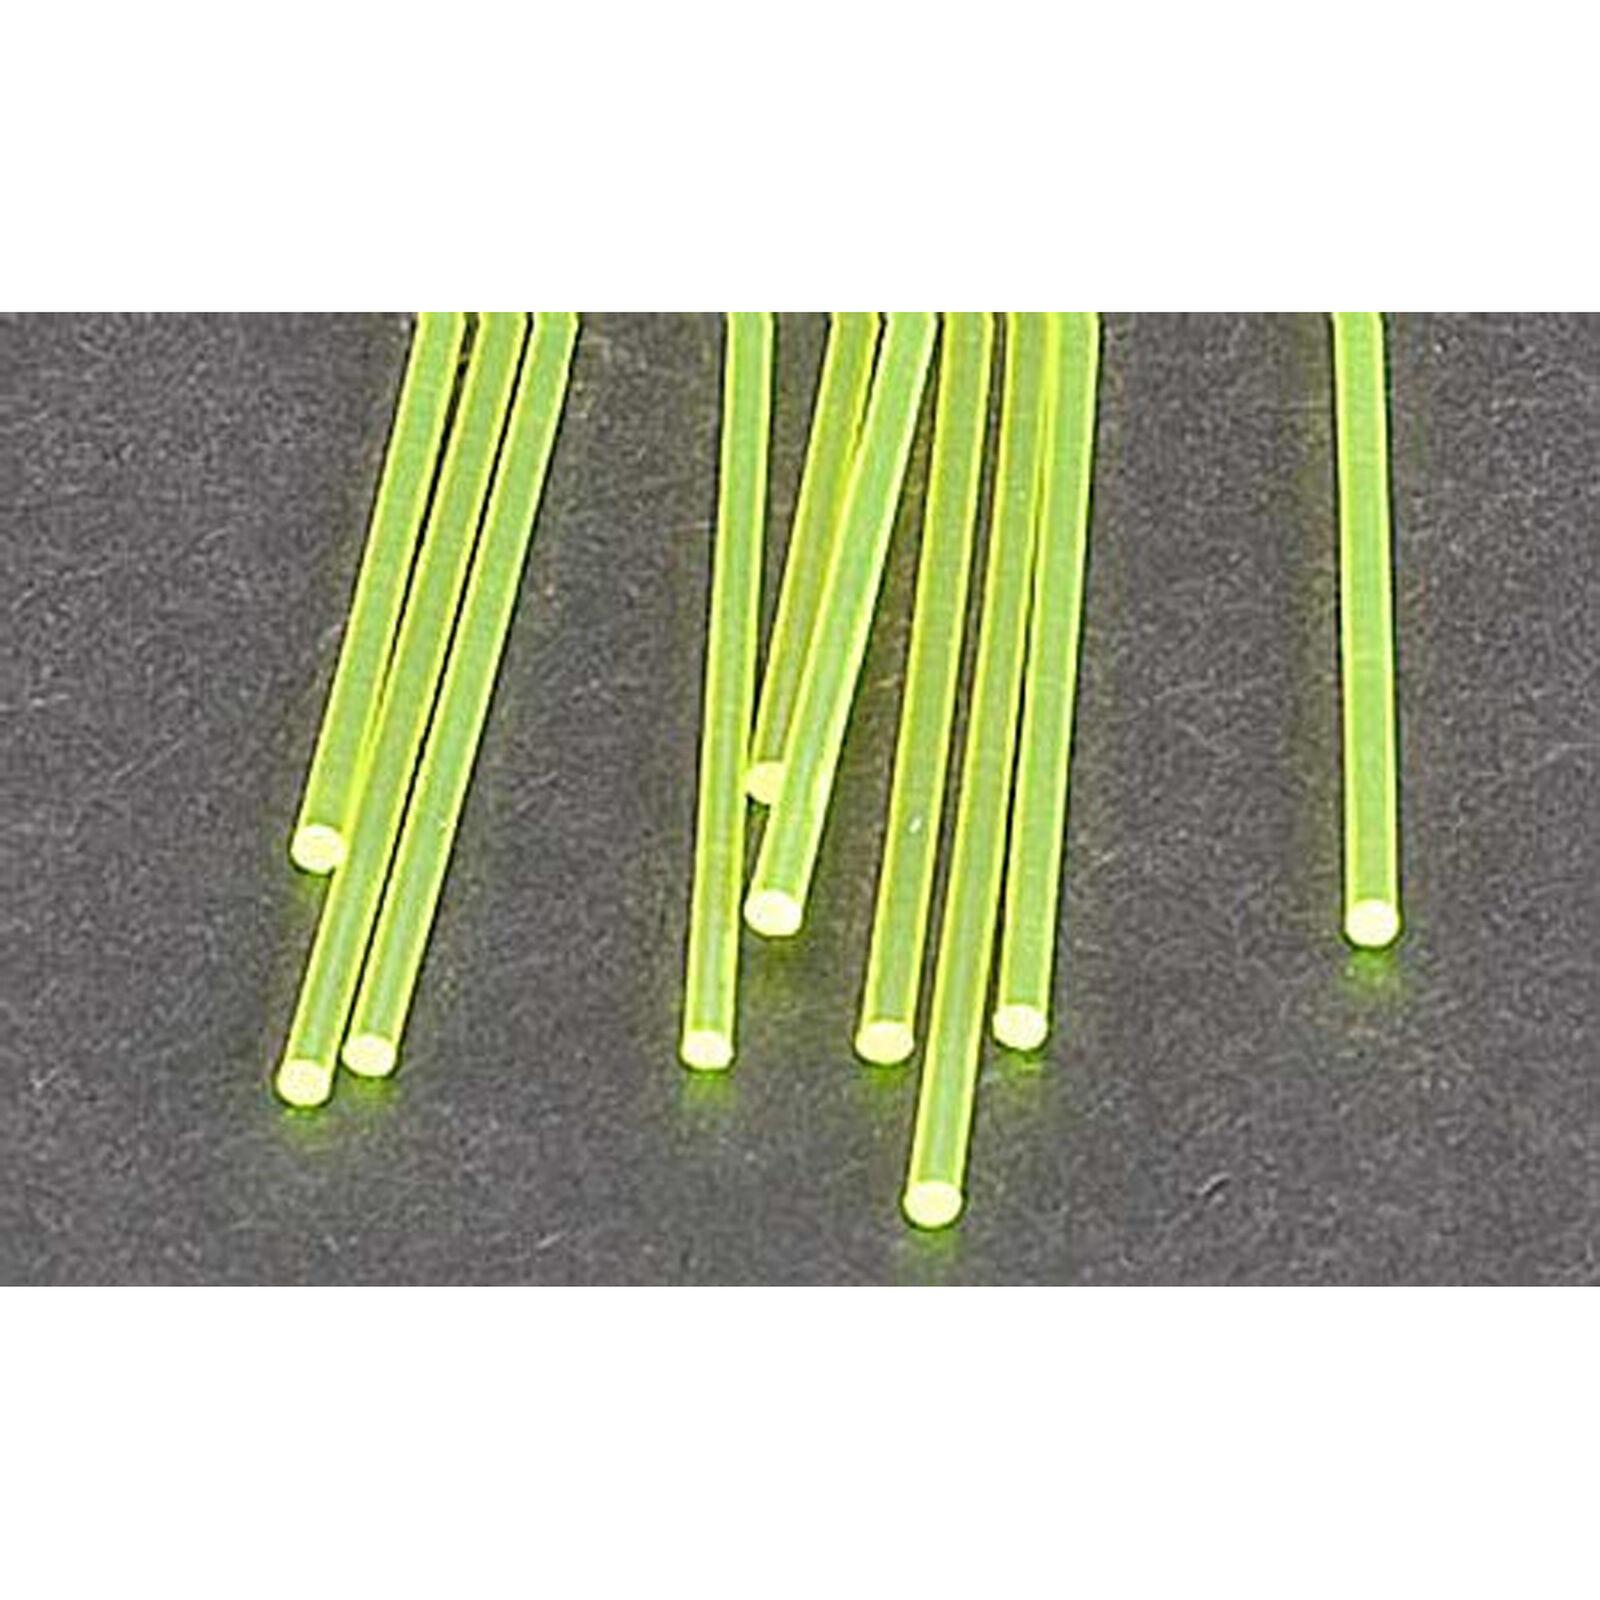 "FARG-2H Fluor Grn Rod,1/16"" (10)"